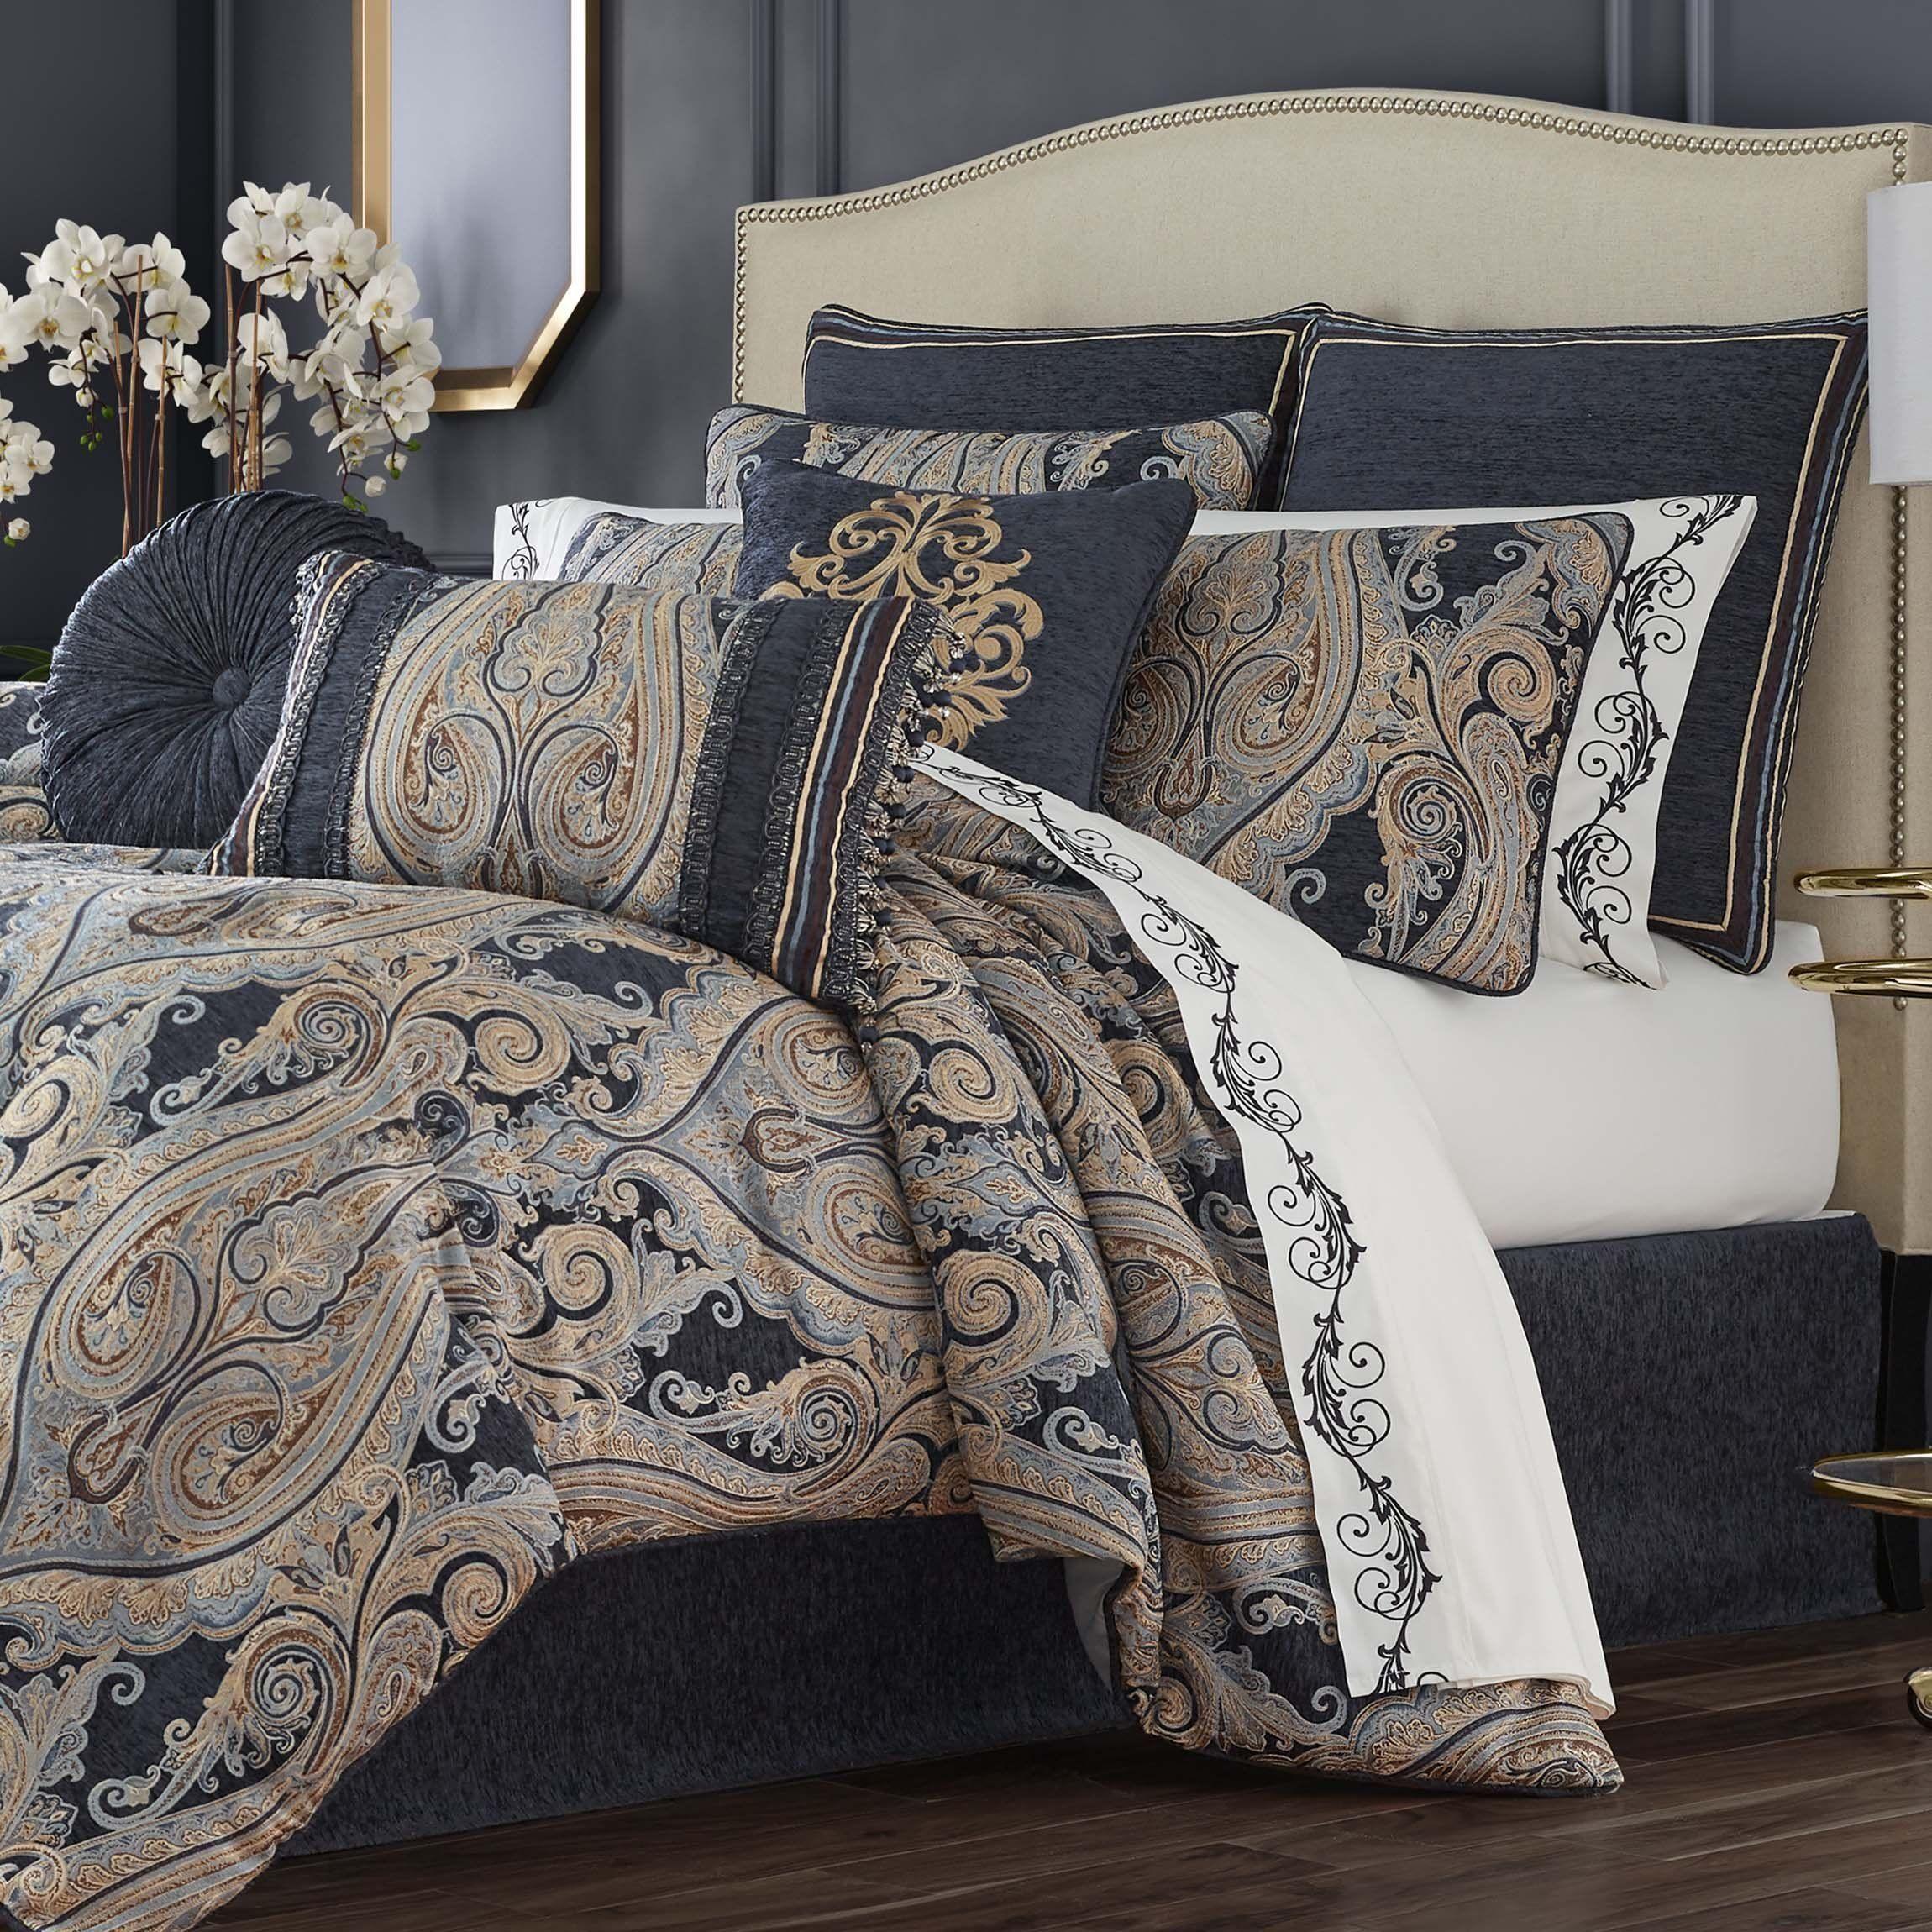 Luciana Indigo 4Piece Comforter Set Latest Bedding in